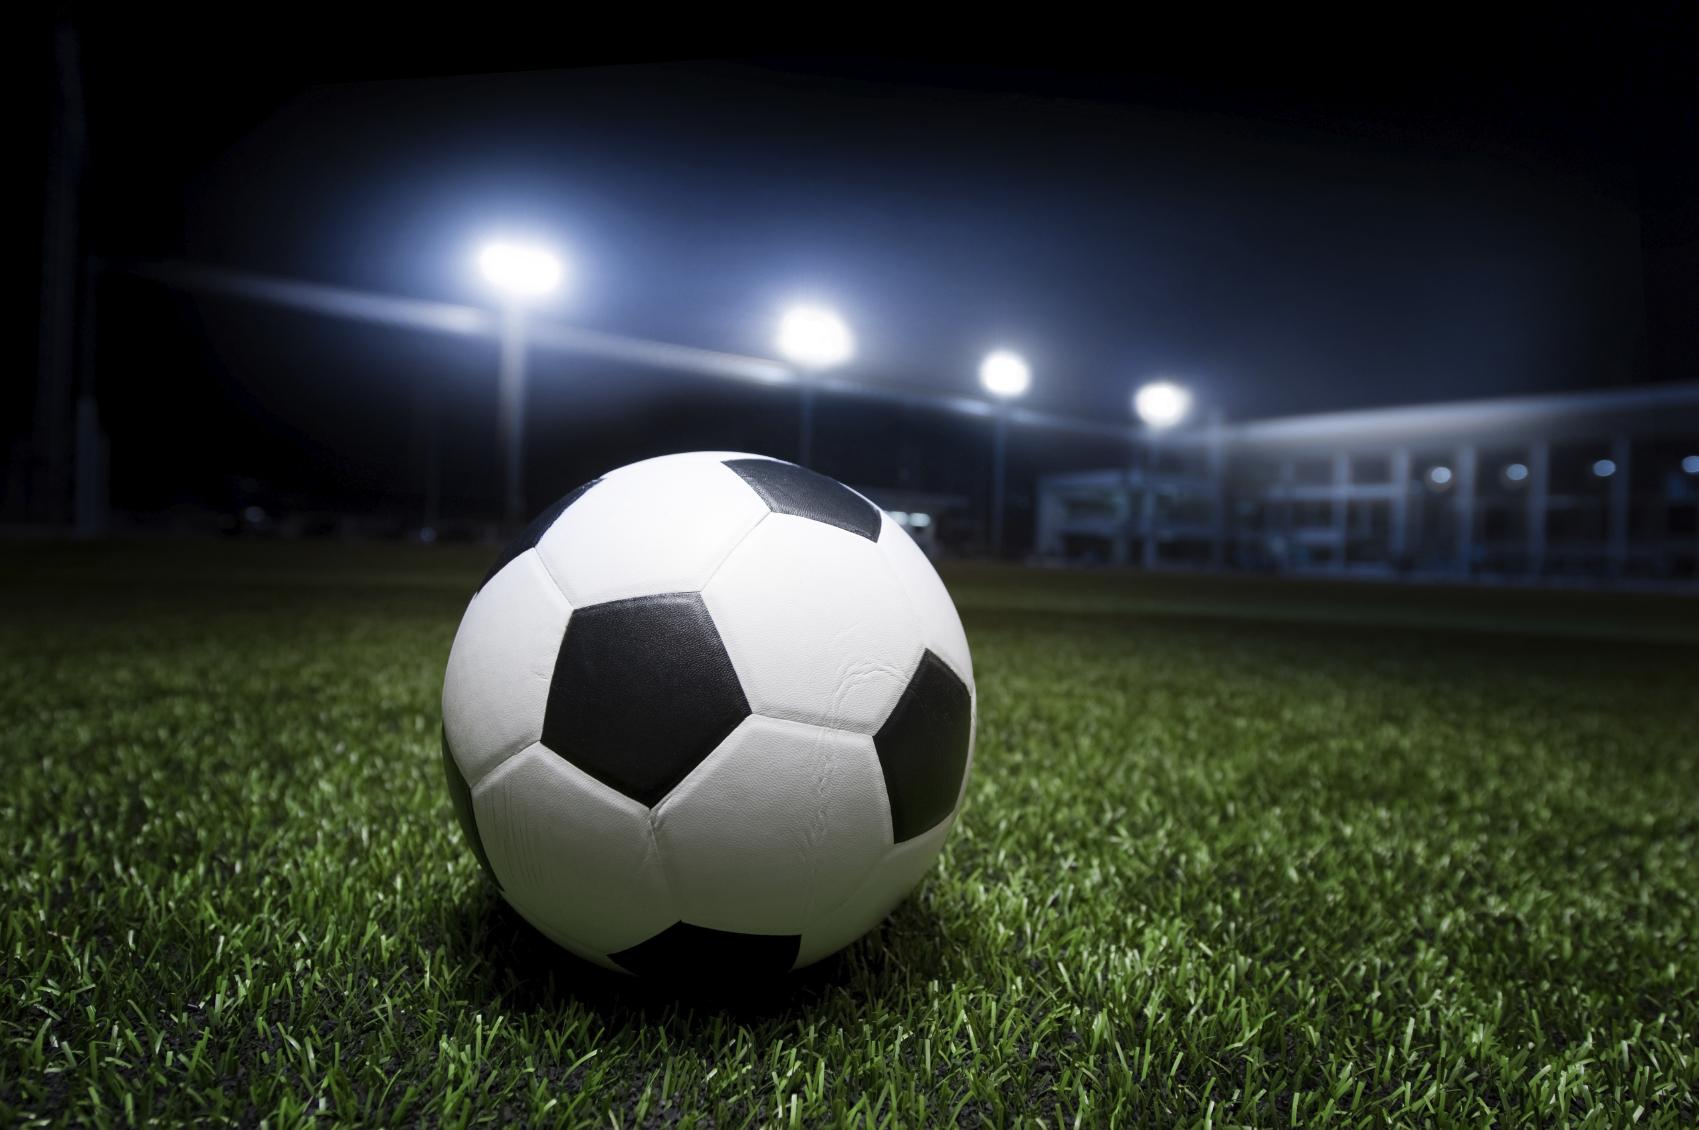 bec soccer soccer news articlesbec soccer soccer news articles